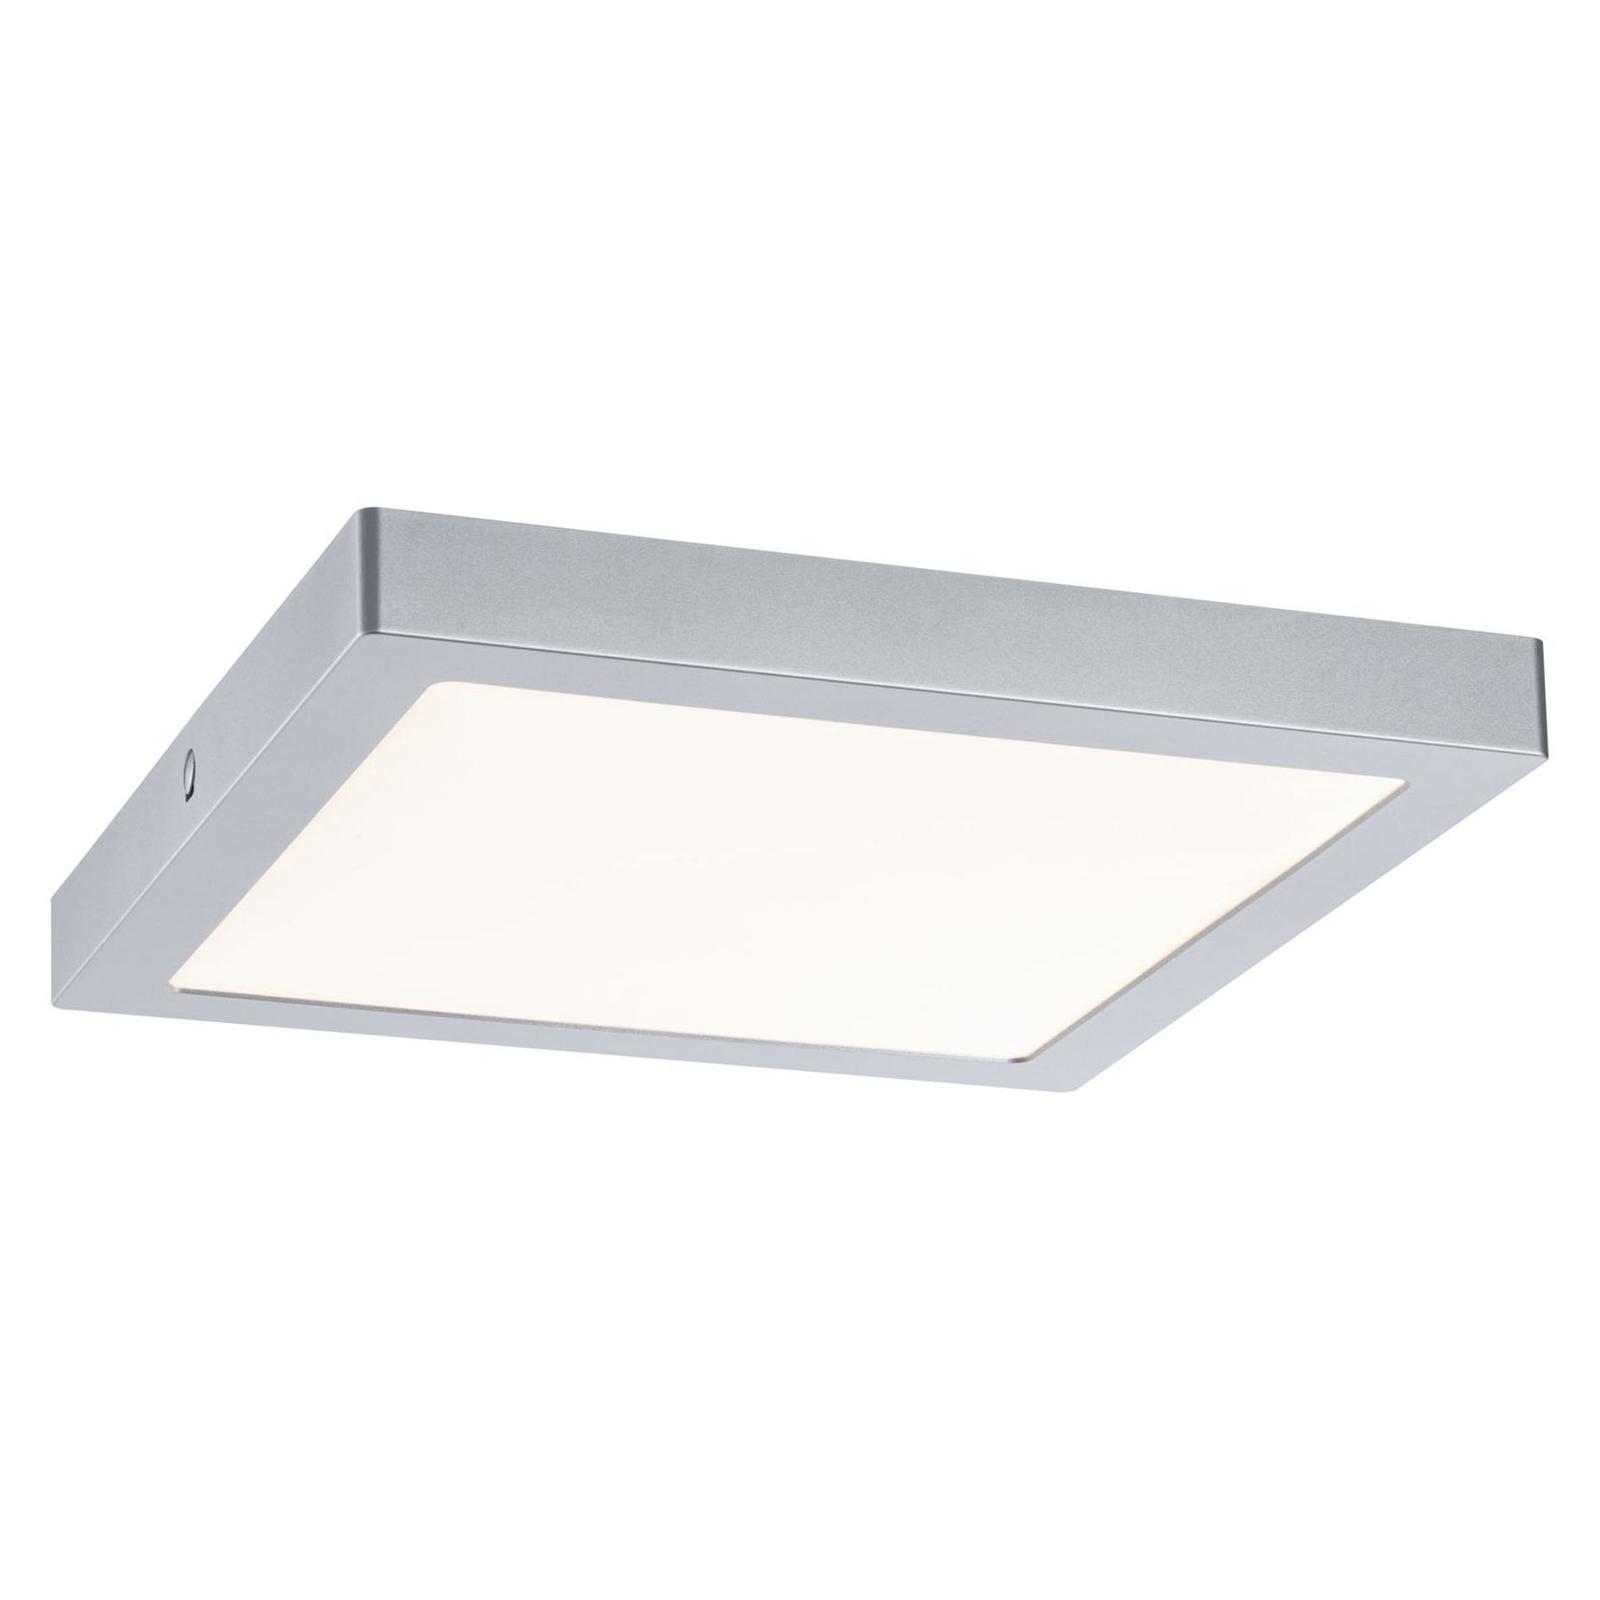 Paulmann Abia LED-taklampe 30x30 cm krom